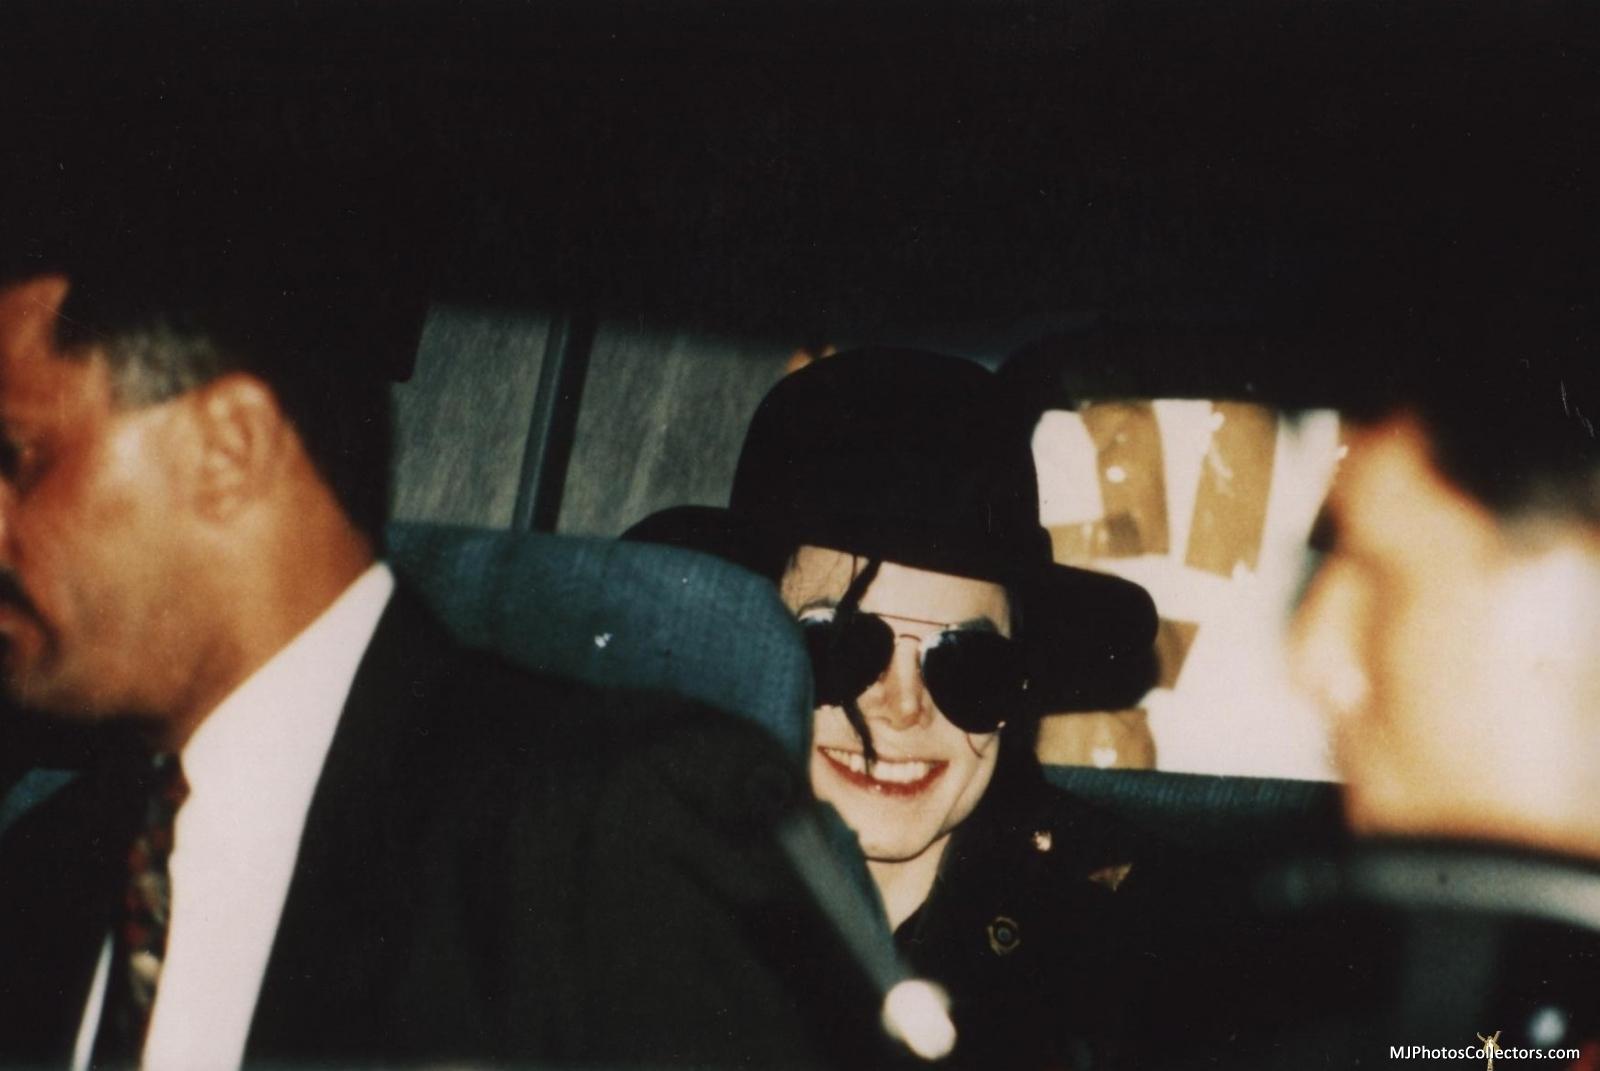 Just MJ..